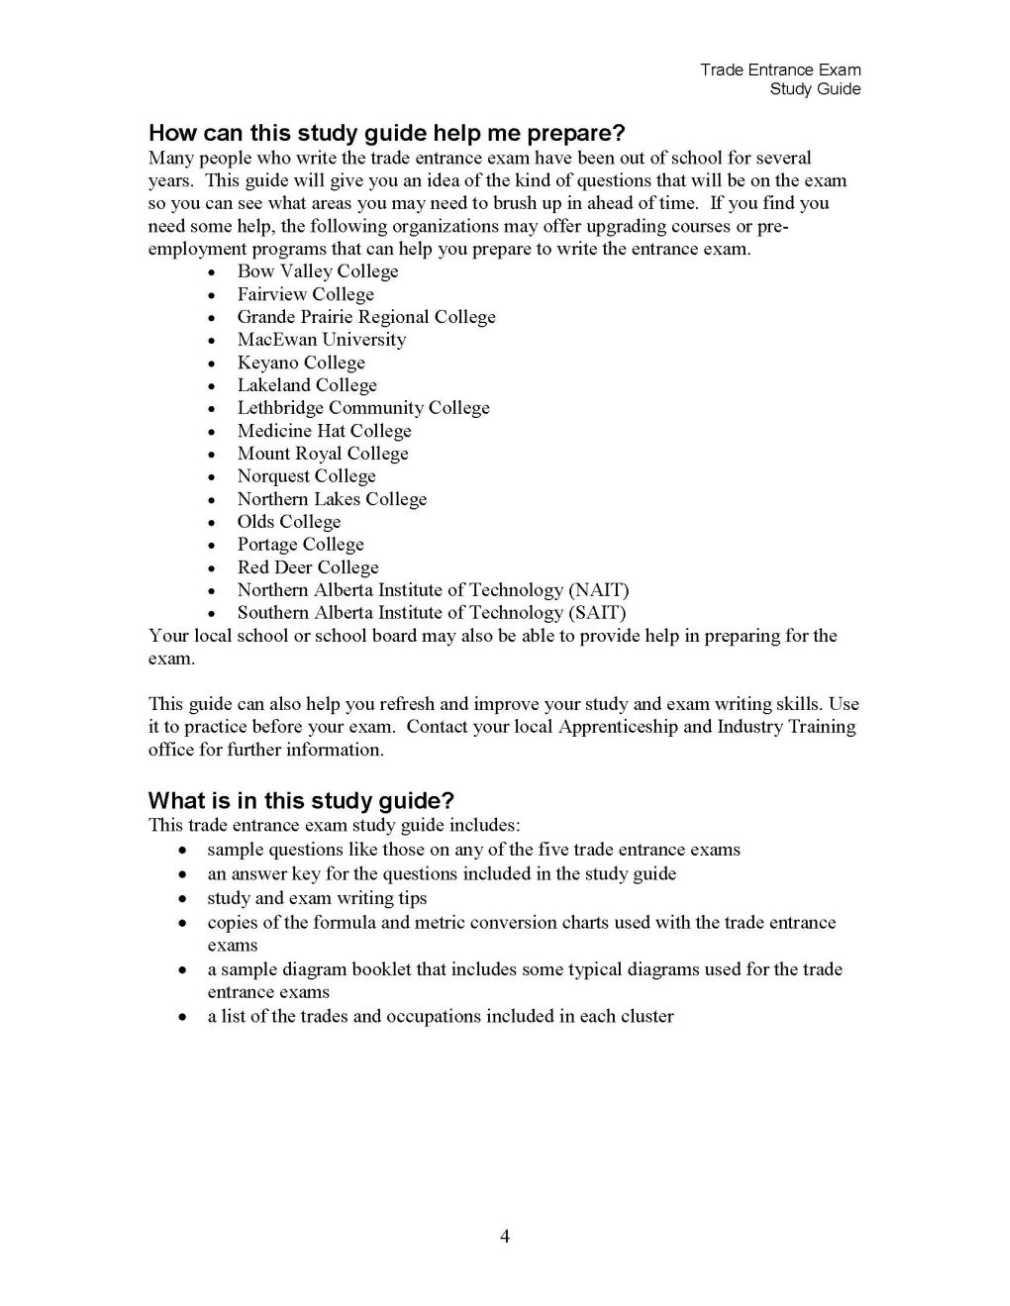 trade entrance exam in alberta 2018 2019 studychacha rh studychacha com Study Guide Exam Outlines trade entrance exam study guide mathematics